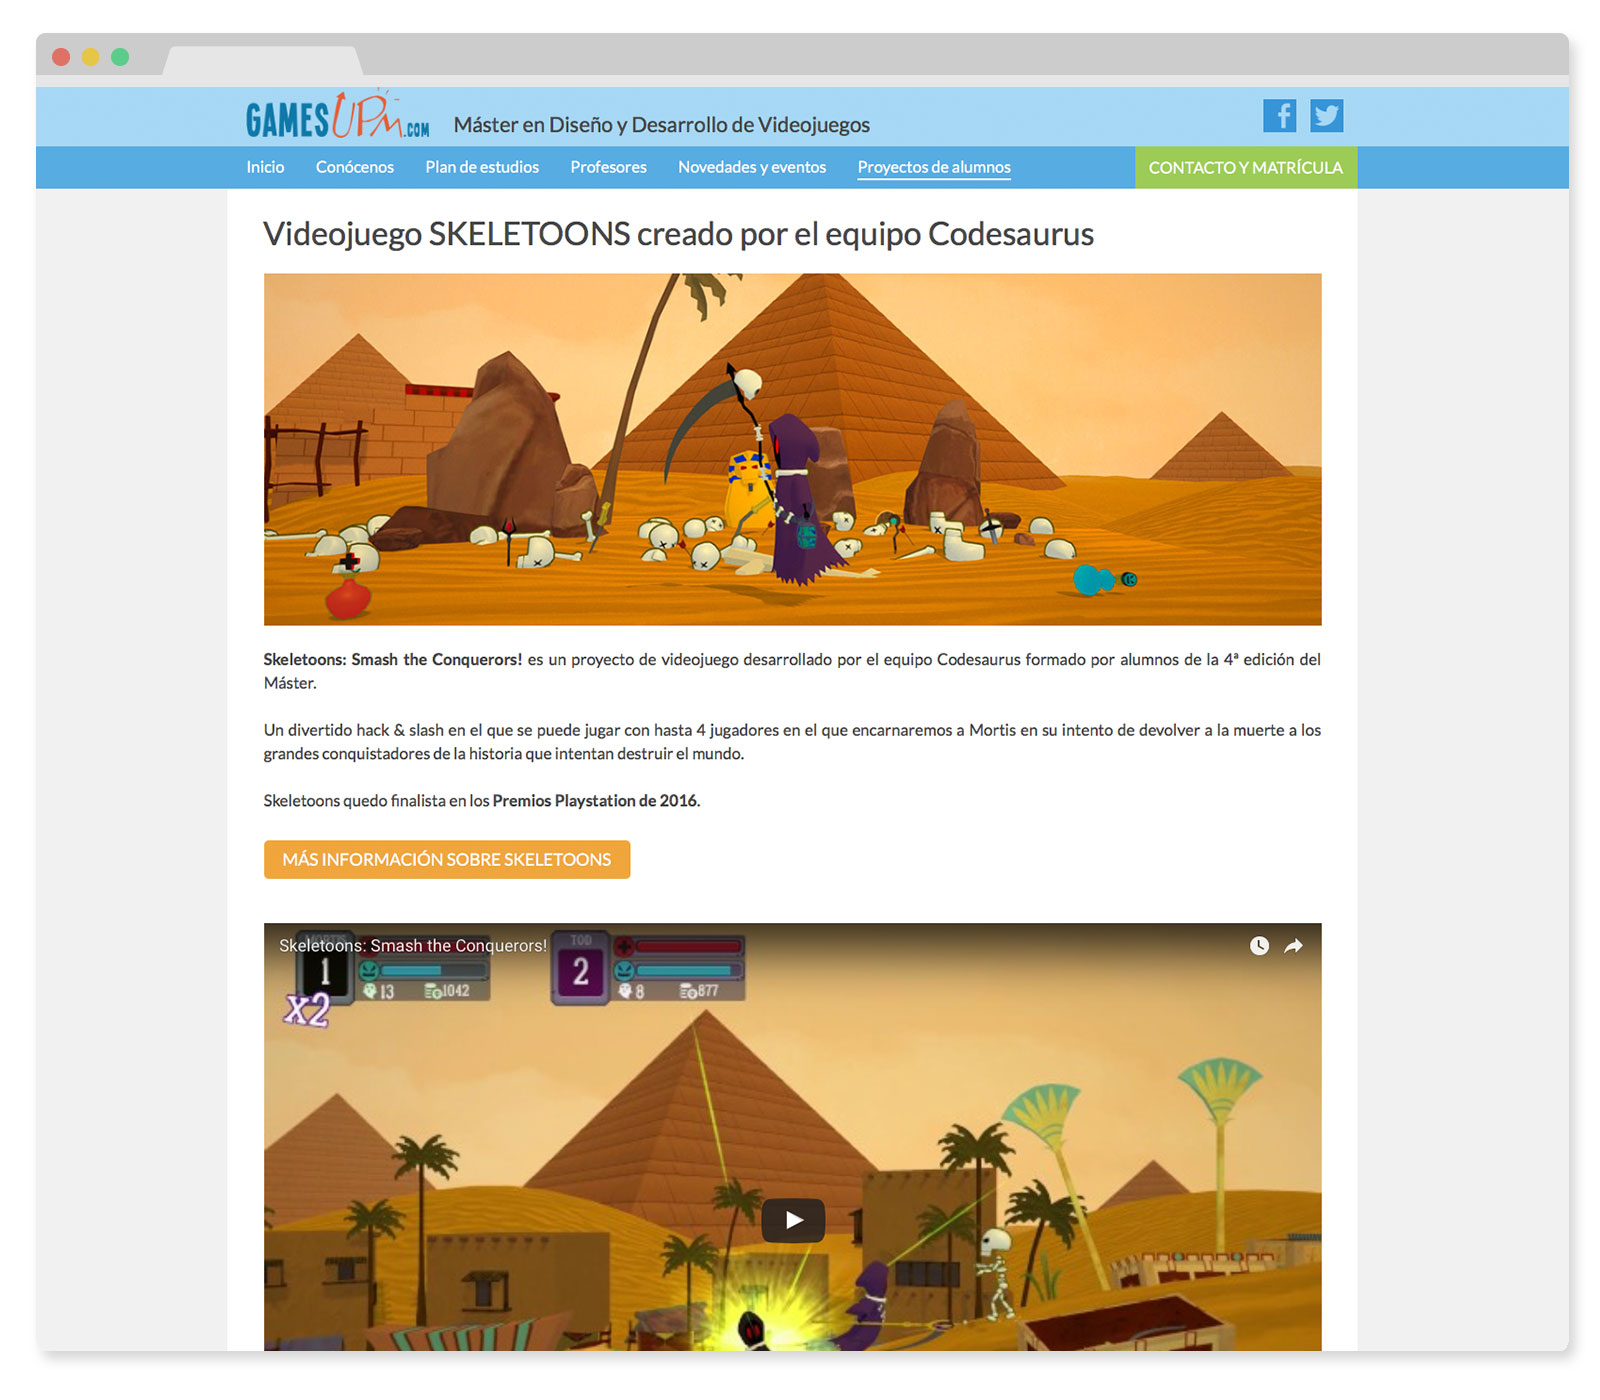 Proyectos alumnos Master Videojuegos GamesUPM